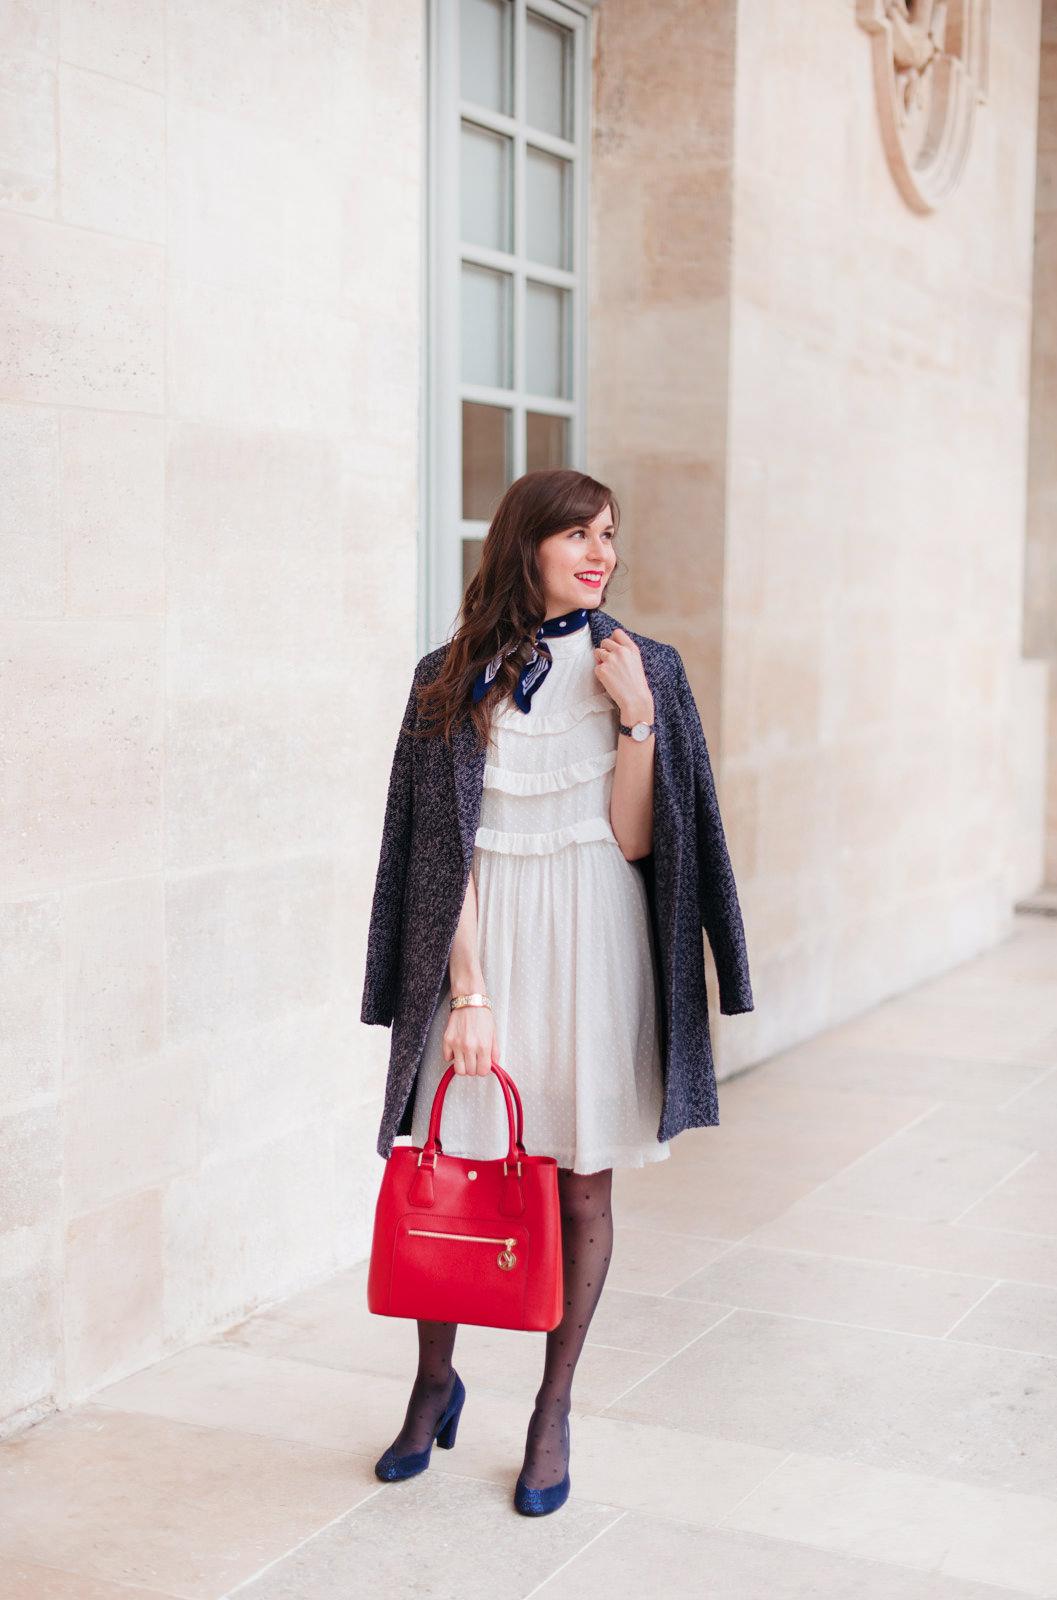 Blog-Mode-And-The-City-Lifestyle-Cinq-Petites-Choses-La-Note-Francaise-2